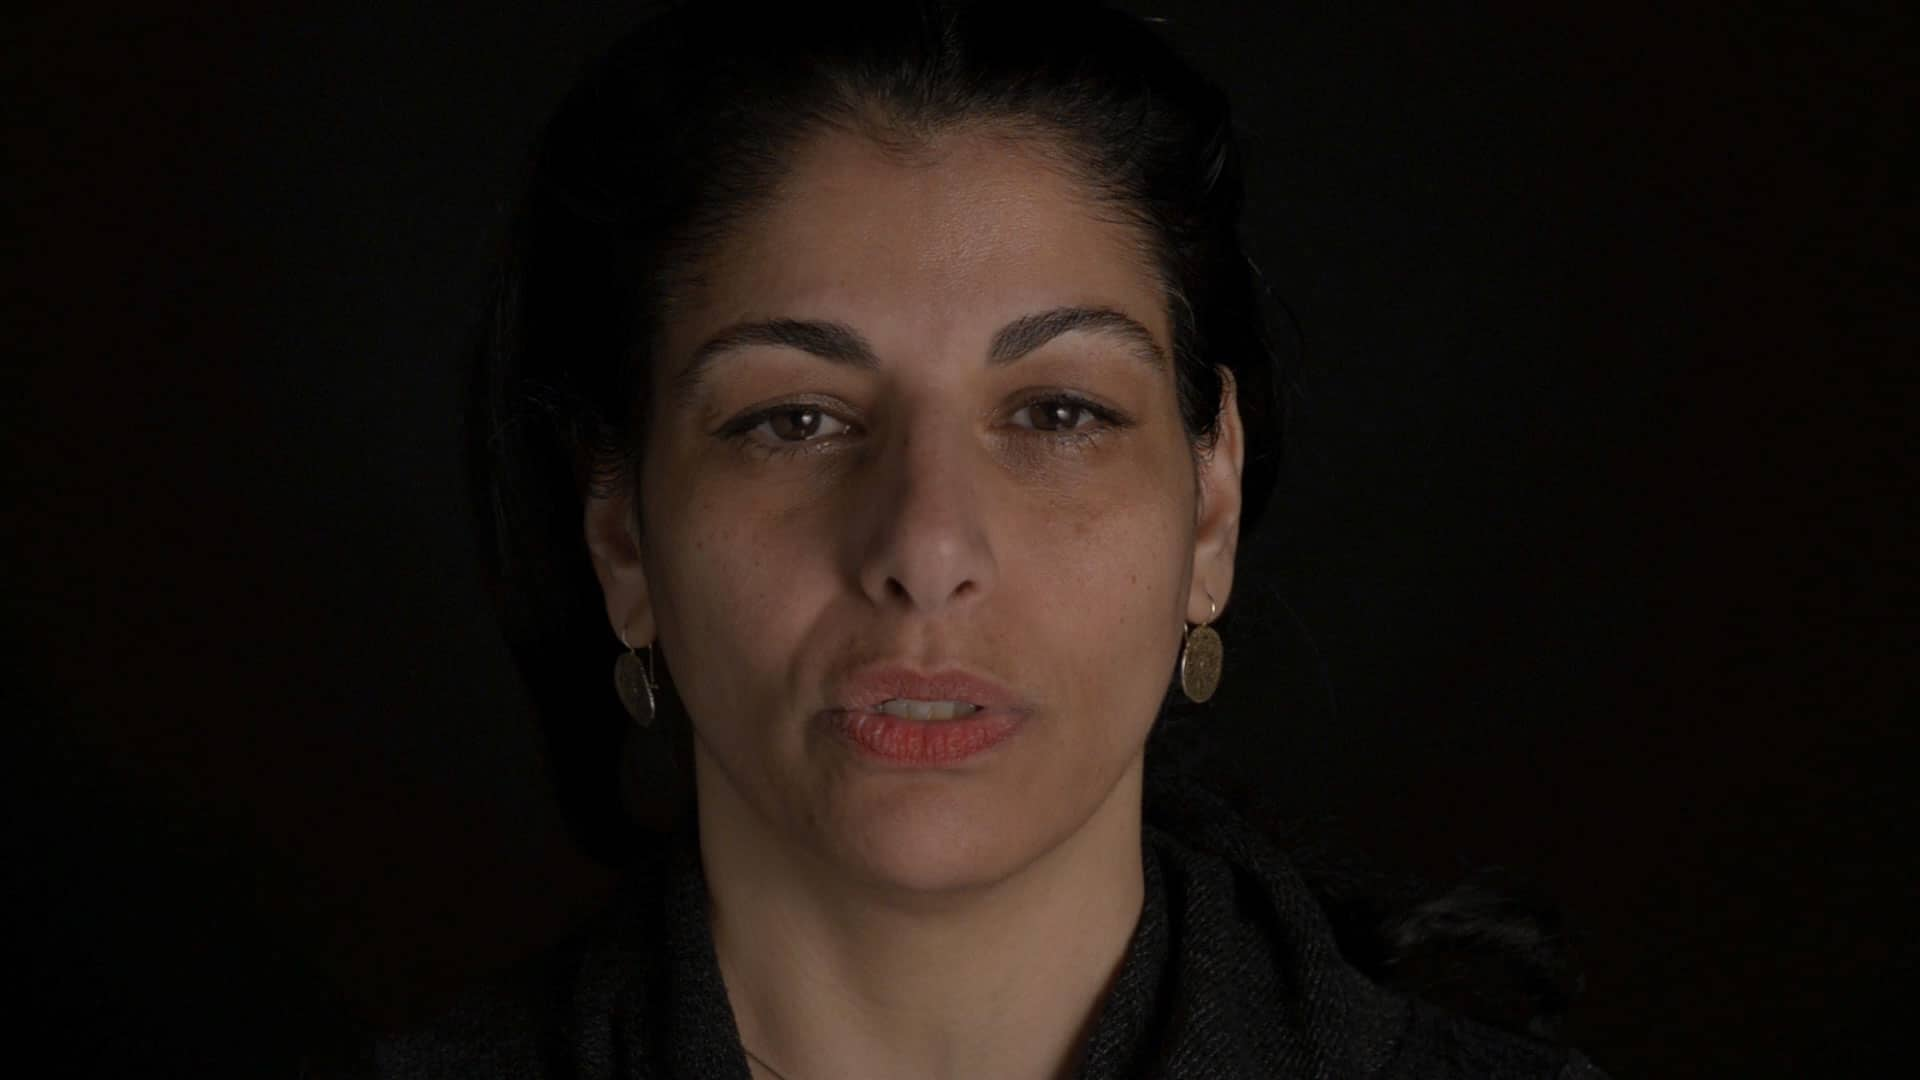 Yael Serlin, Kaddish, 2018. Video, 5 min. Photography: Doron Oved. © The artist